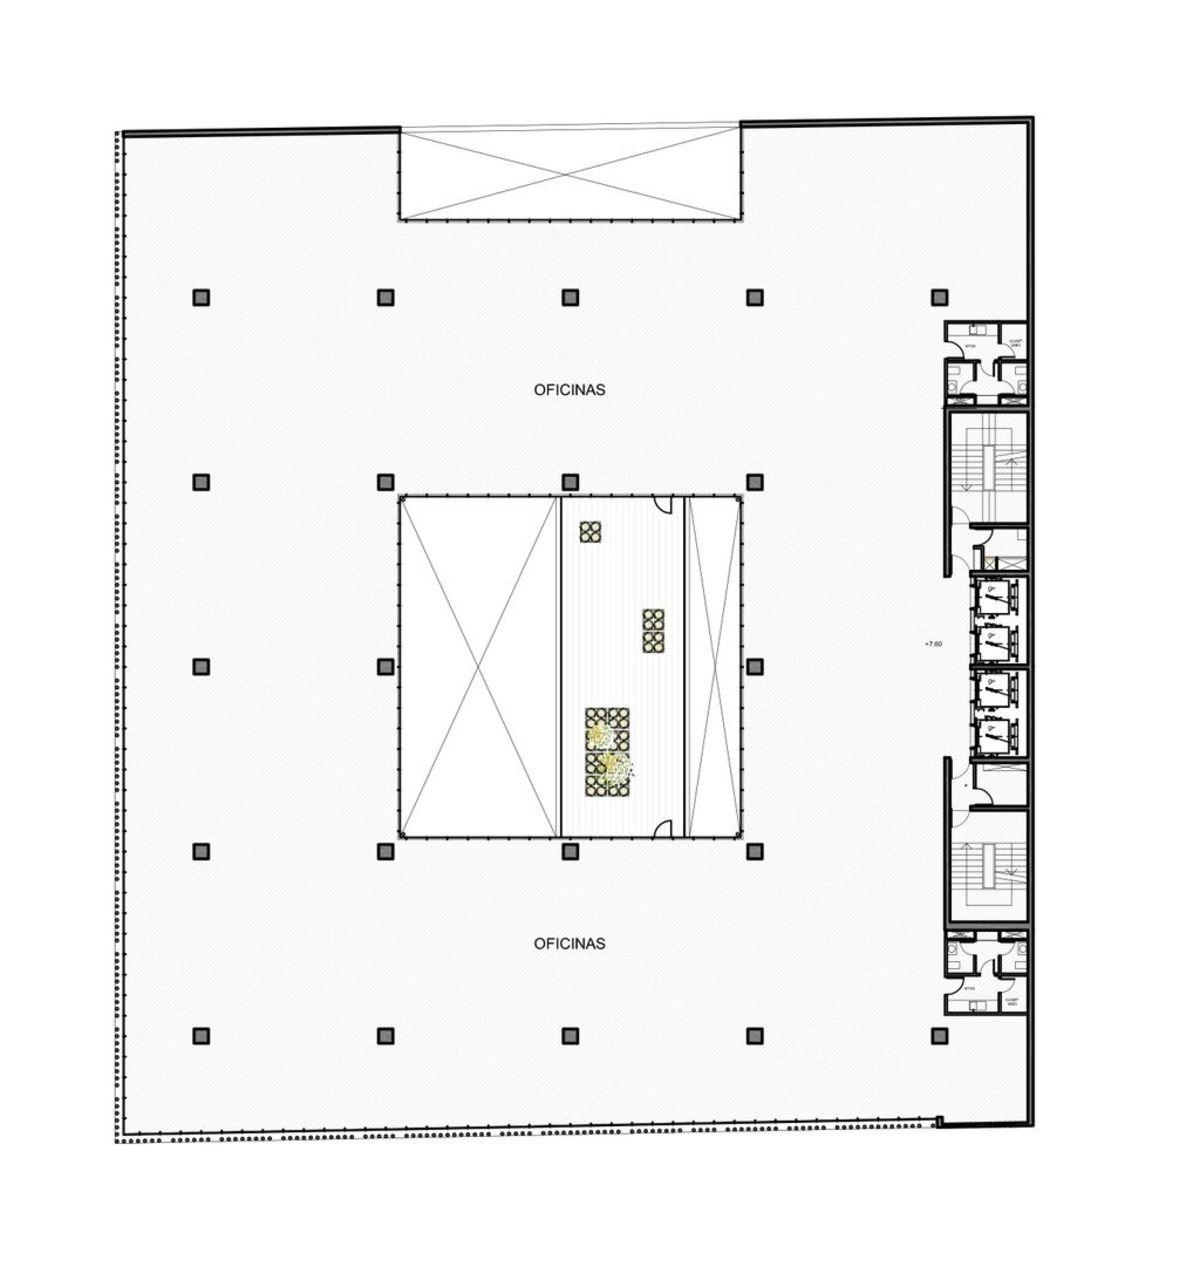 Undurraga Deves Arquitectos And The Santa Ana Offices In